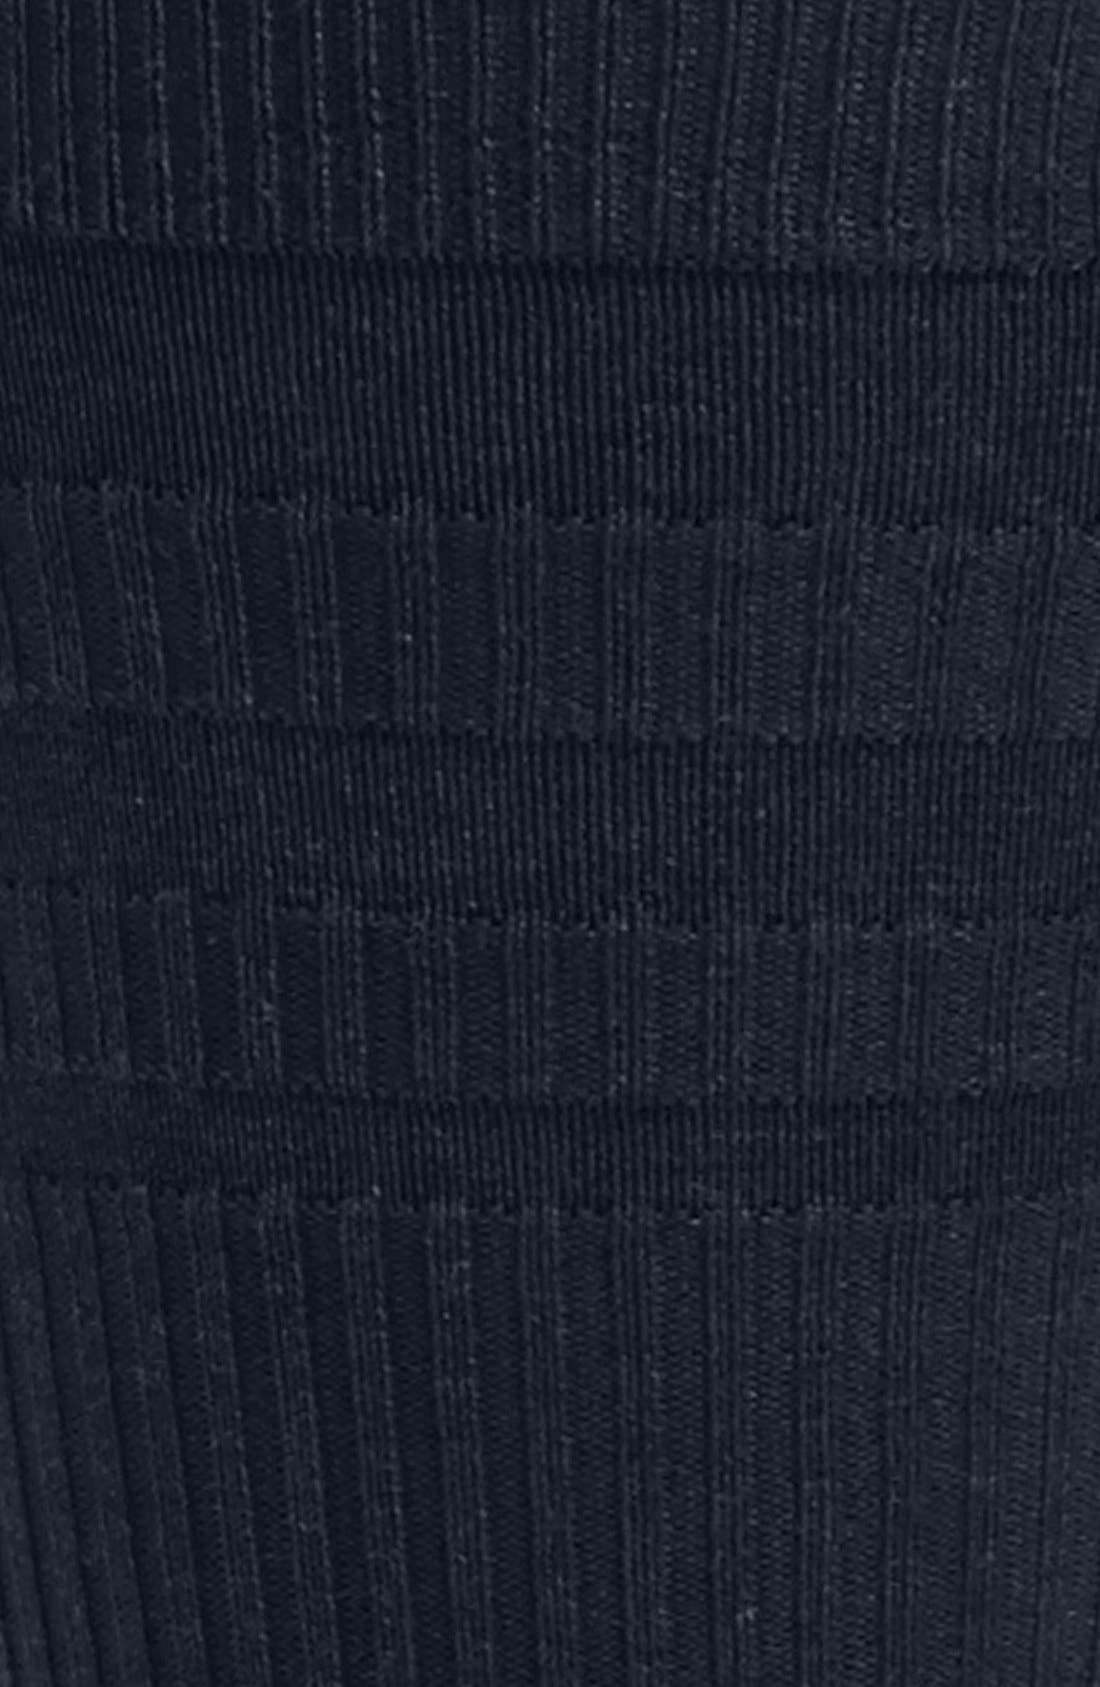 Alternate Image 2  - Pantherella 'Comfort Top' Dress Socks